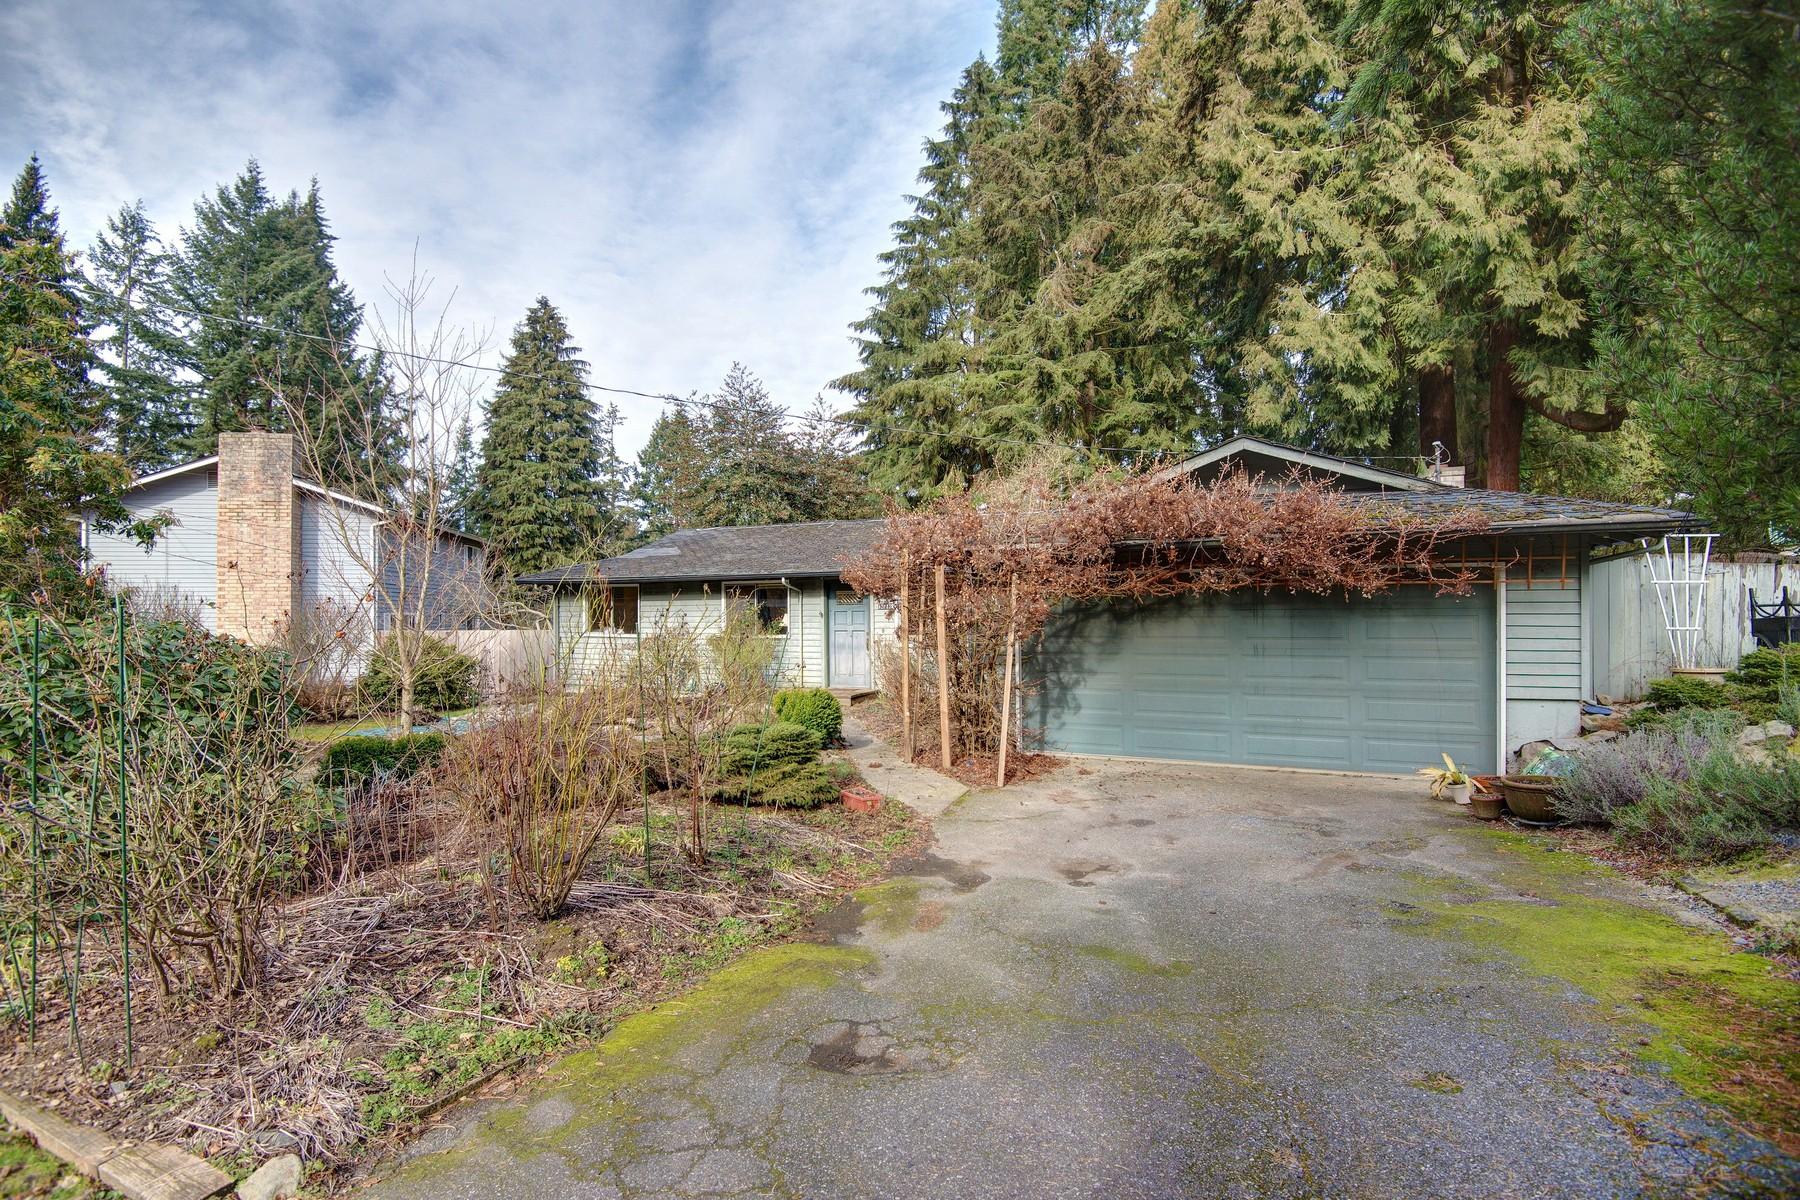 Single Family Home for Sale at Traditional Rose Hill Home 12812 NE 73 St Kirkland, Washington 98033 United States